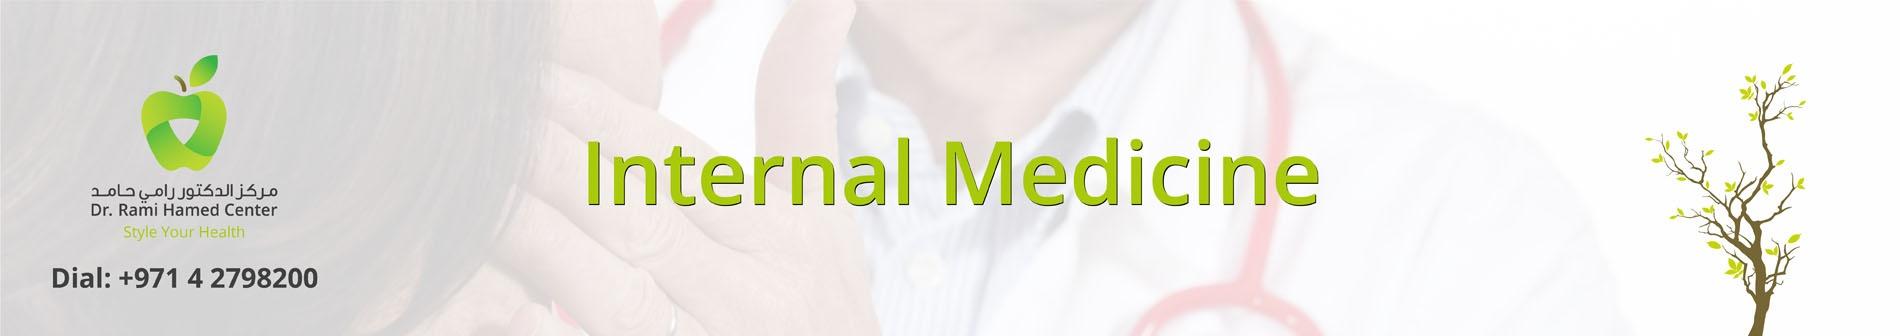 Internal Medicine.jpg